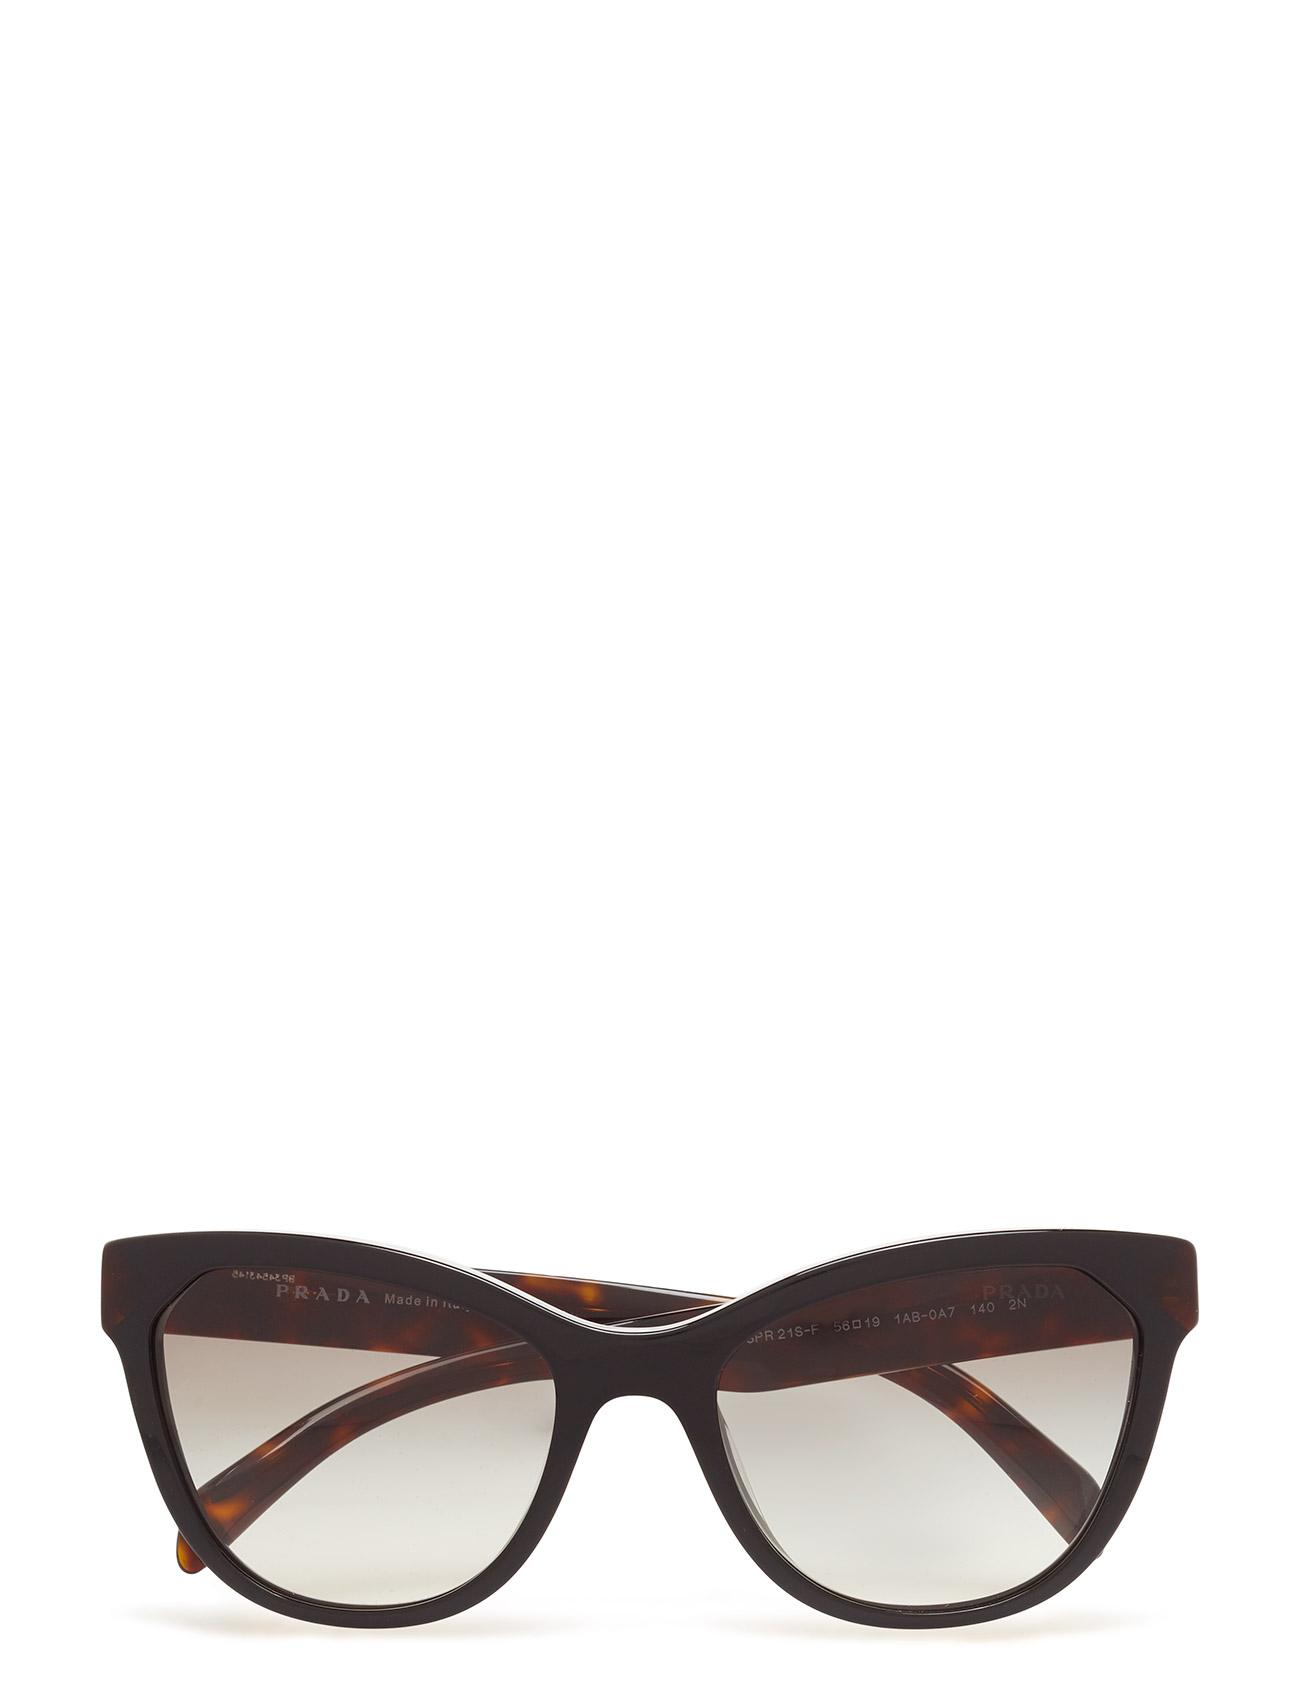 39f16d9ed2f7 Heritage Prada Sunglasses Solbriller til Damer i